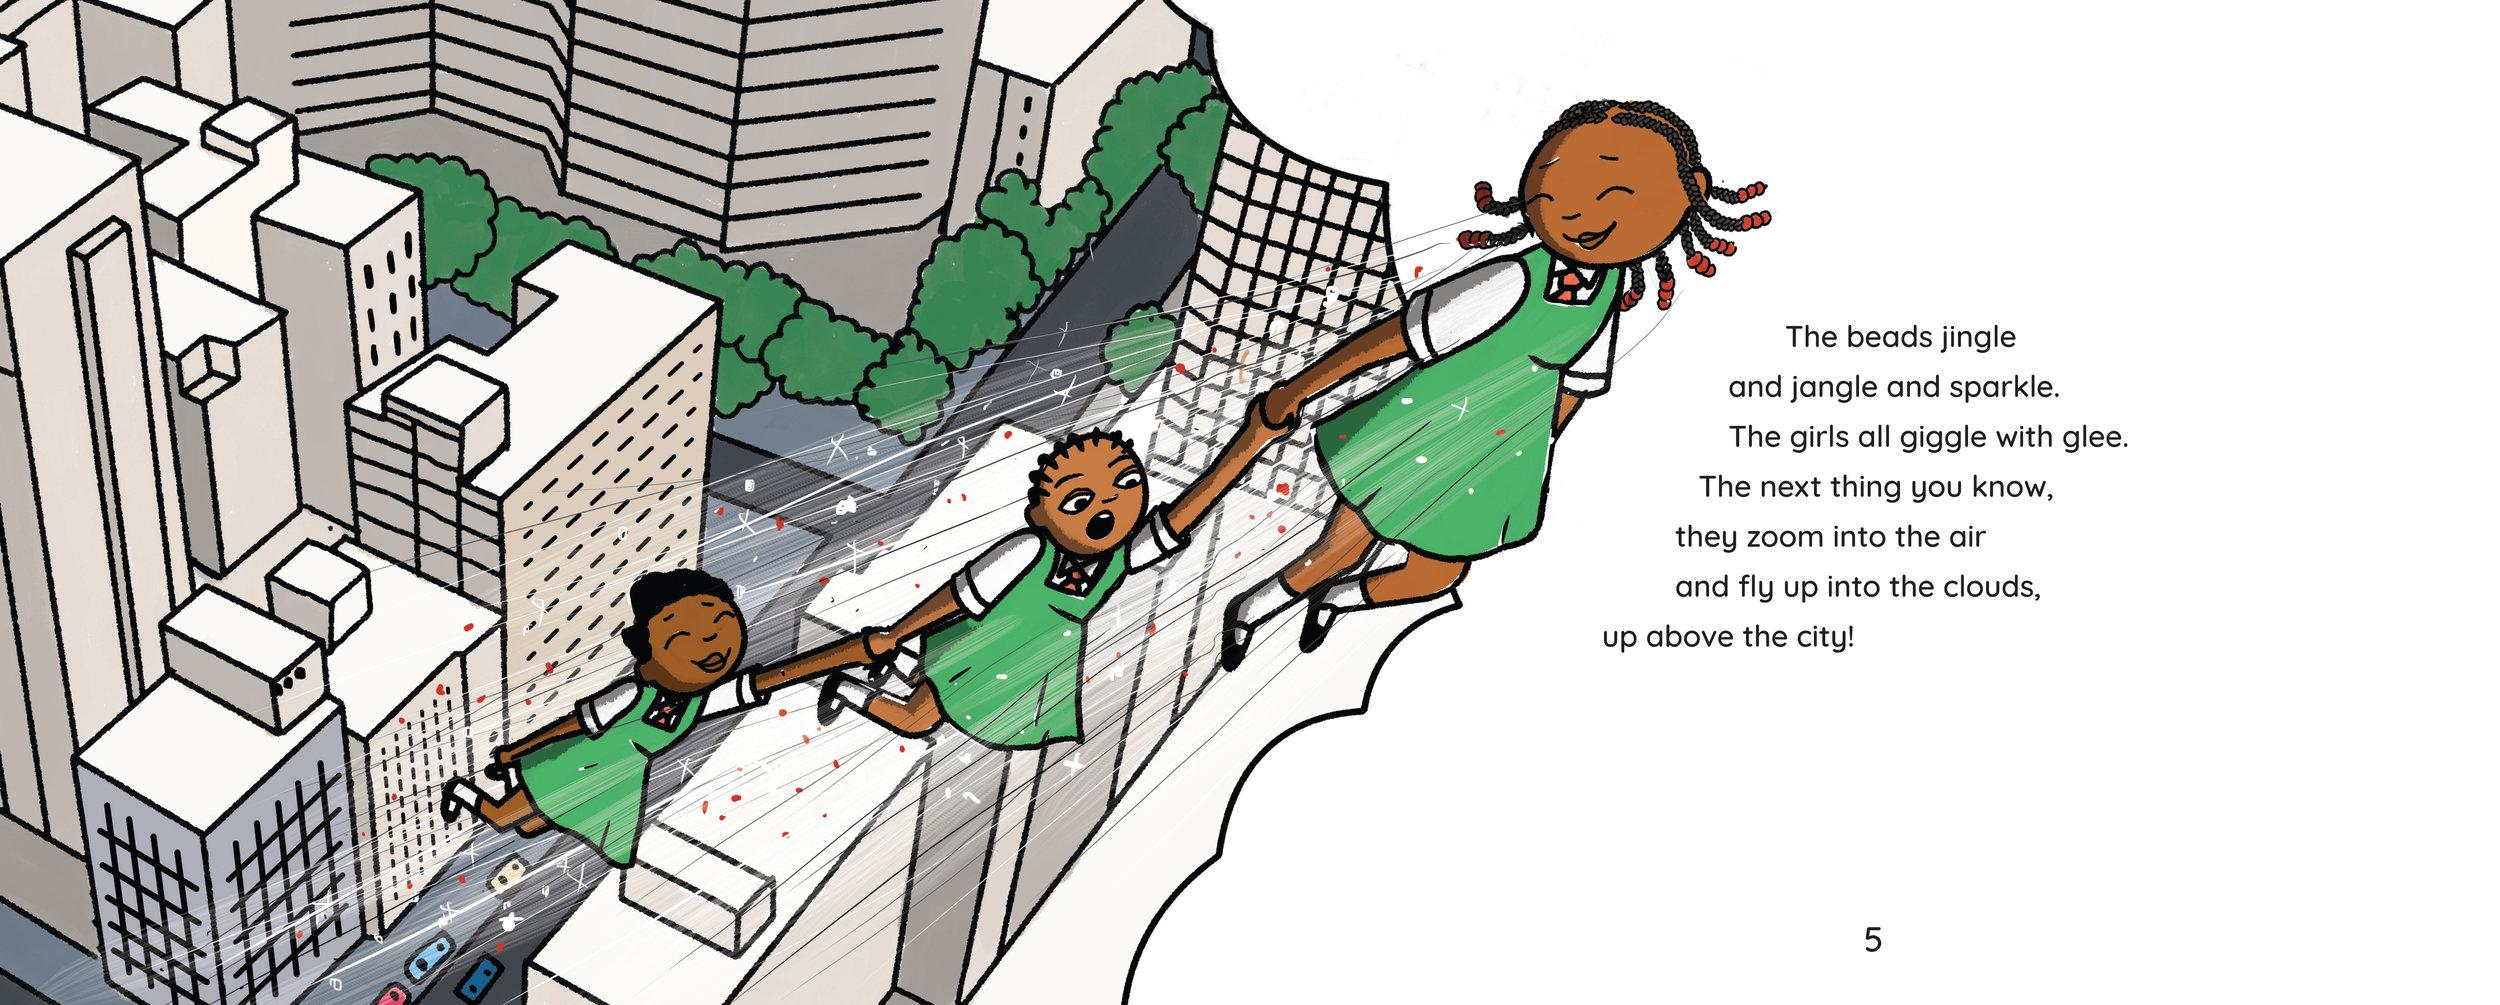 A sneak peek inside the delightful children's book,   Mpumi's Magic Beads   by Lebohang Masango.